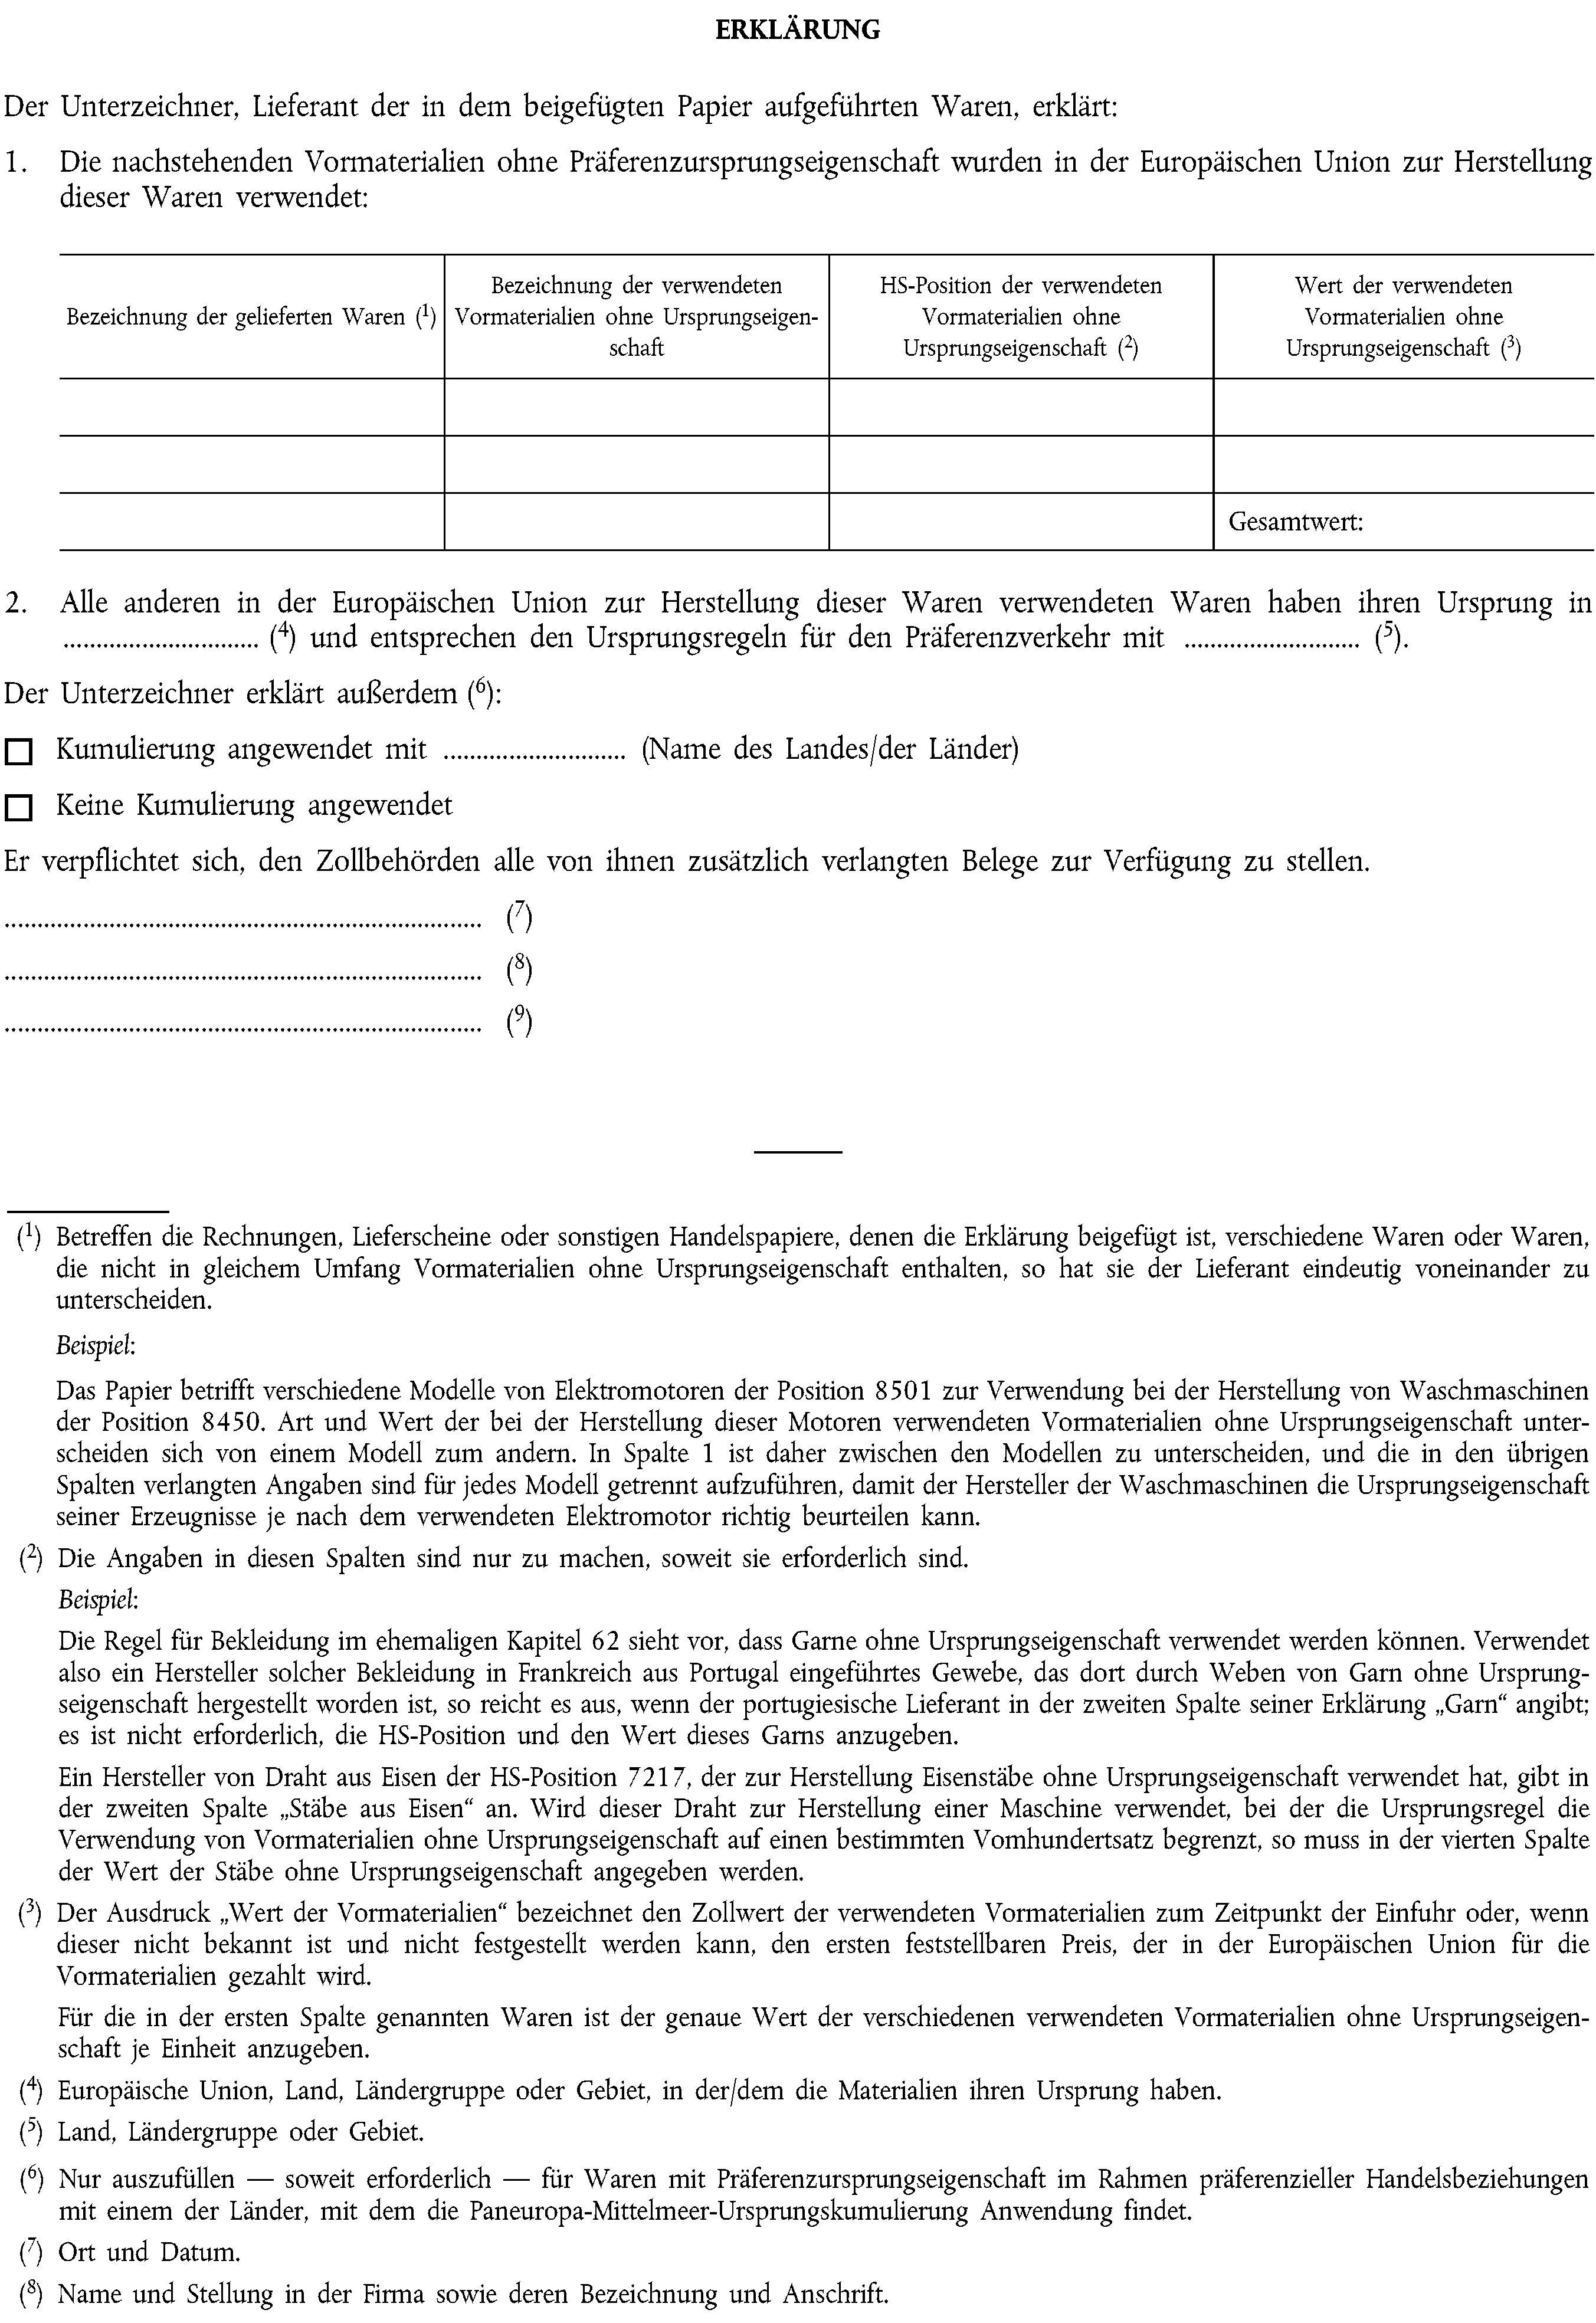 eur lex 02015r2447 20151229 en eur lex - Lieferantenerklrung Muster